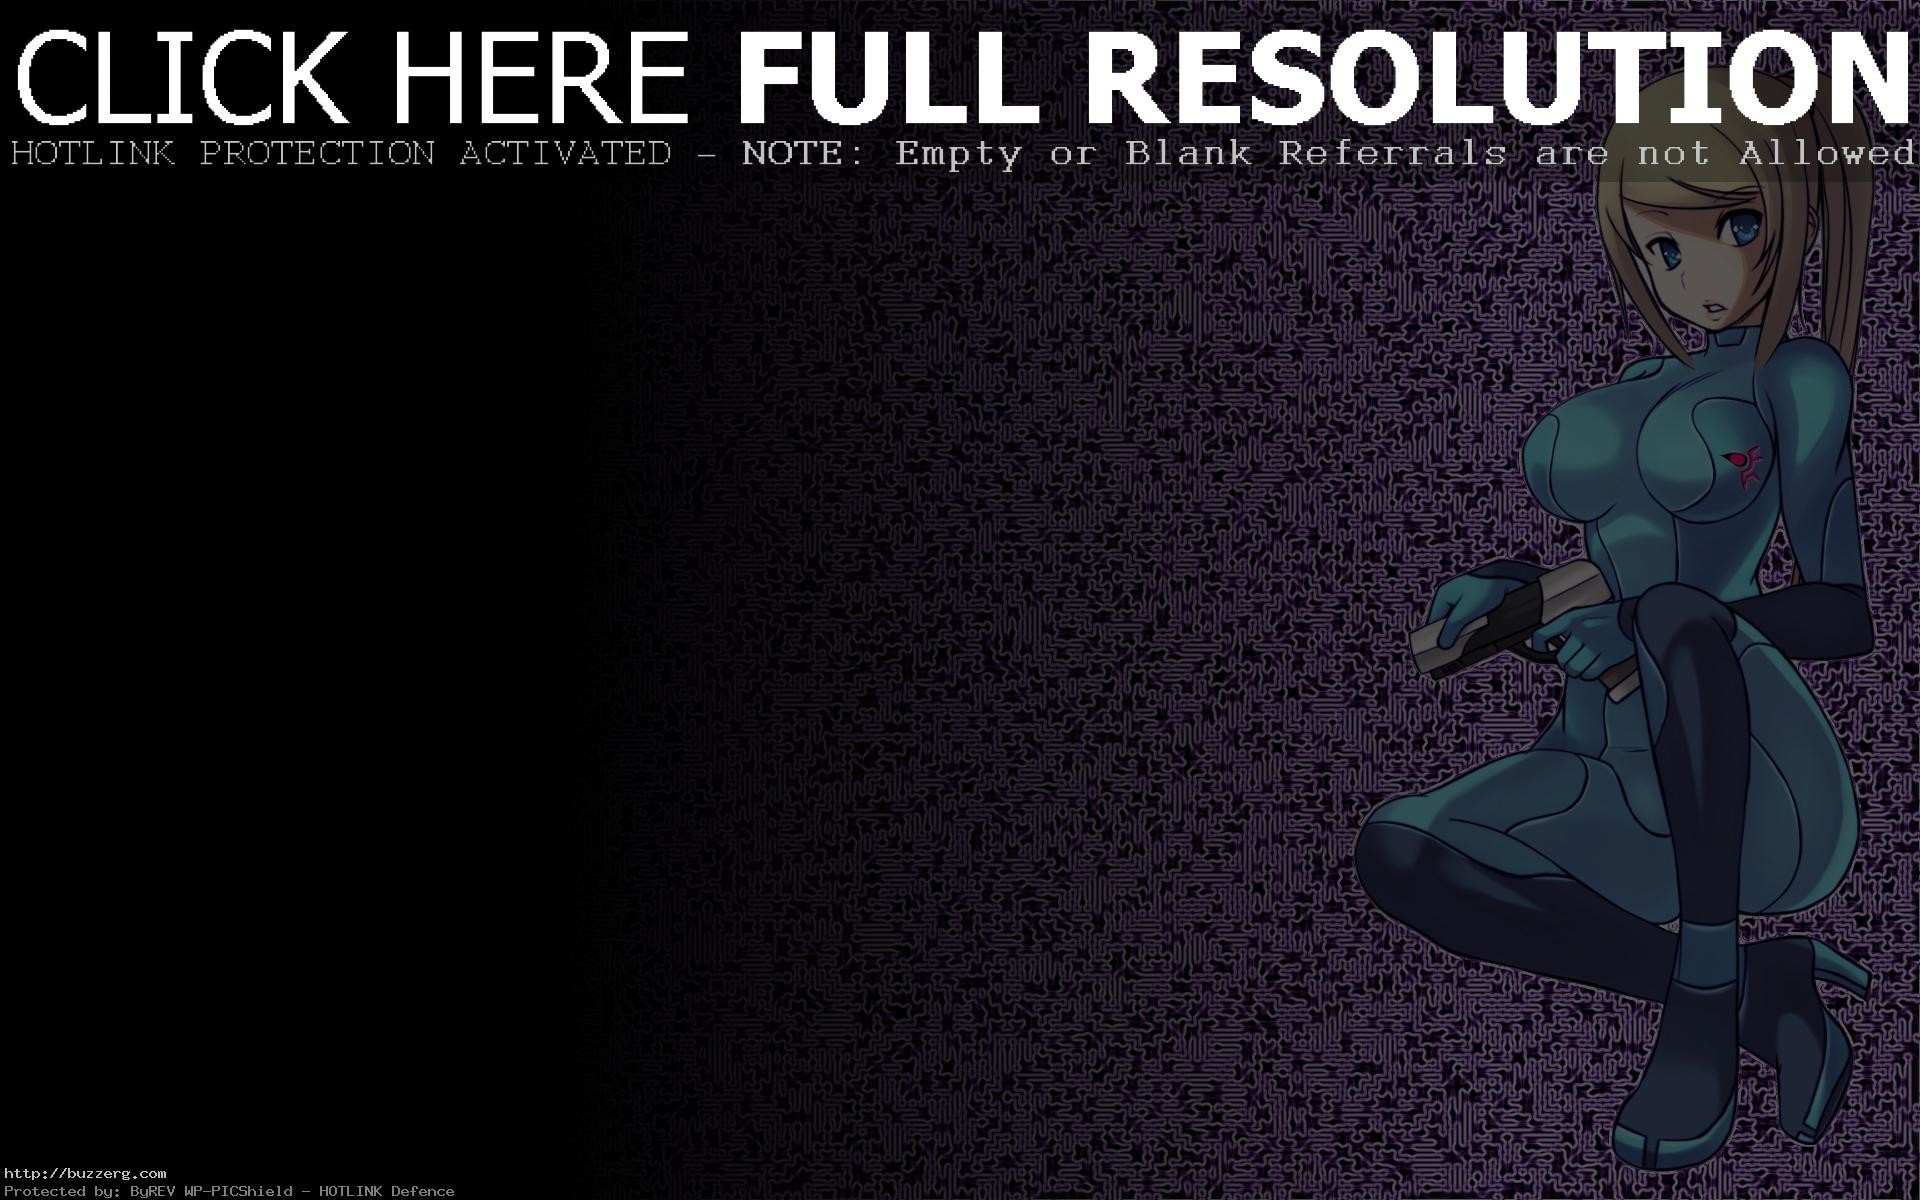 The Of Metroid Zero Suit Samus Aran Fresh (id: 171785)